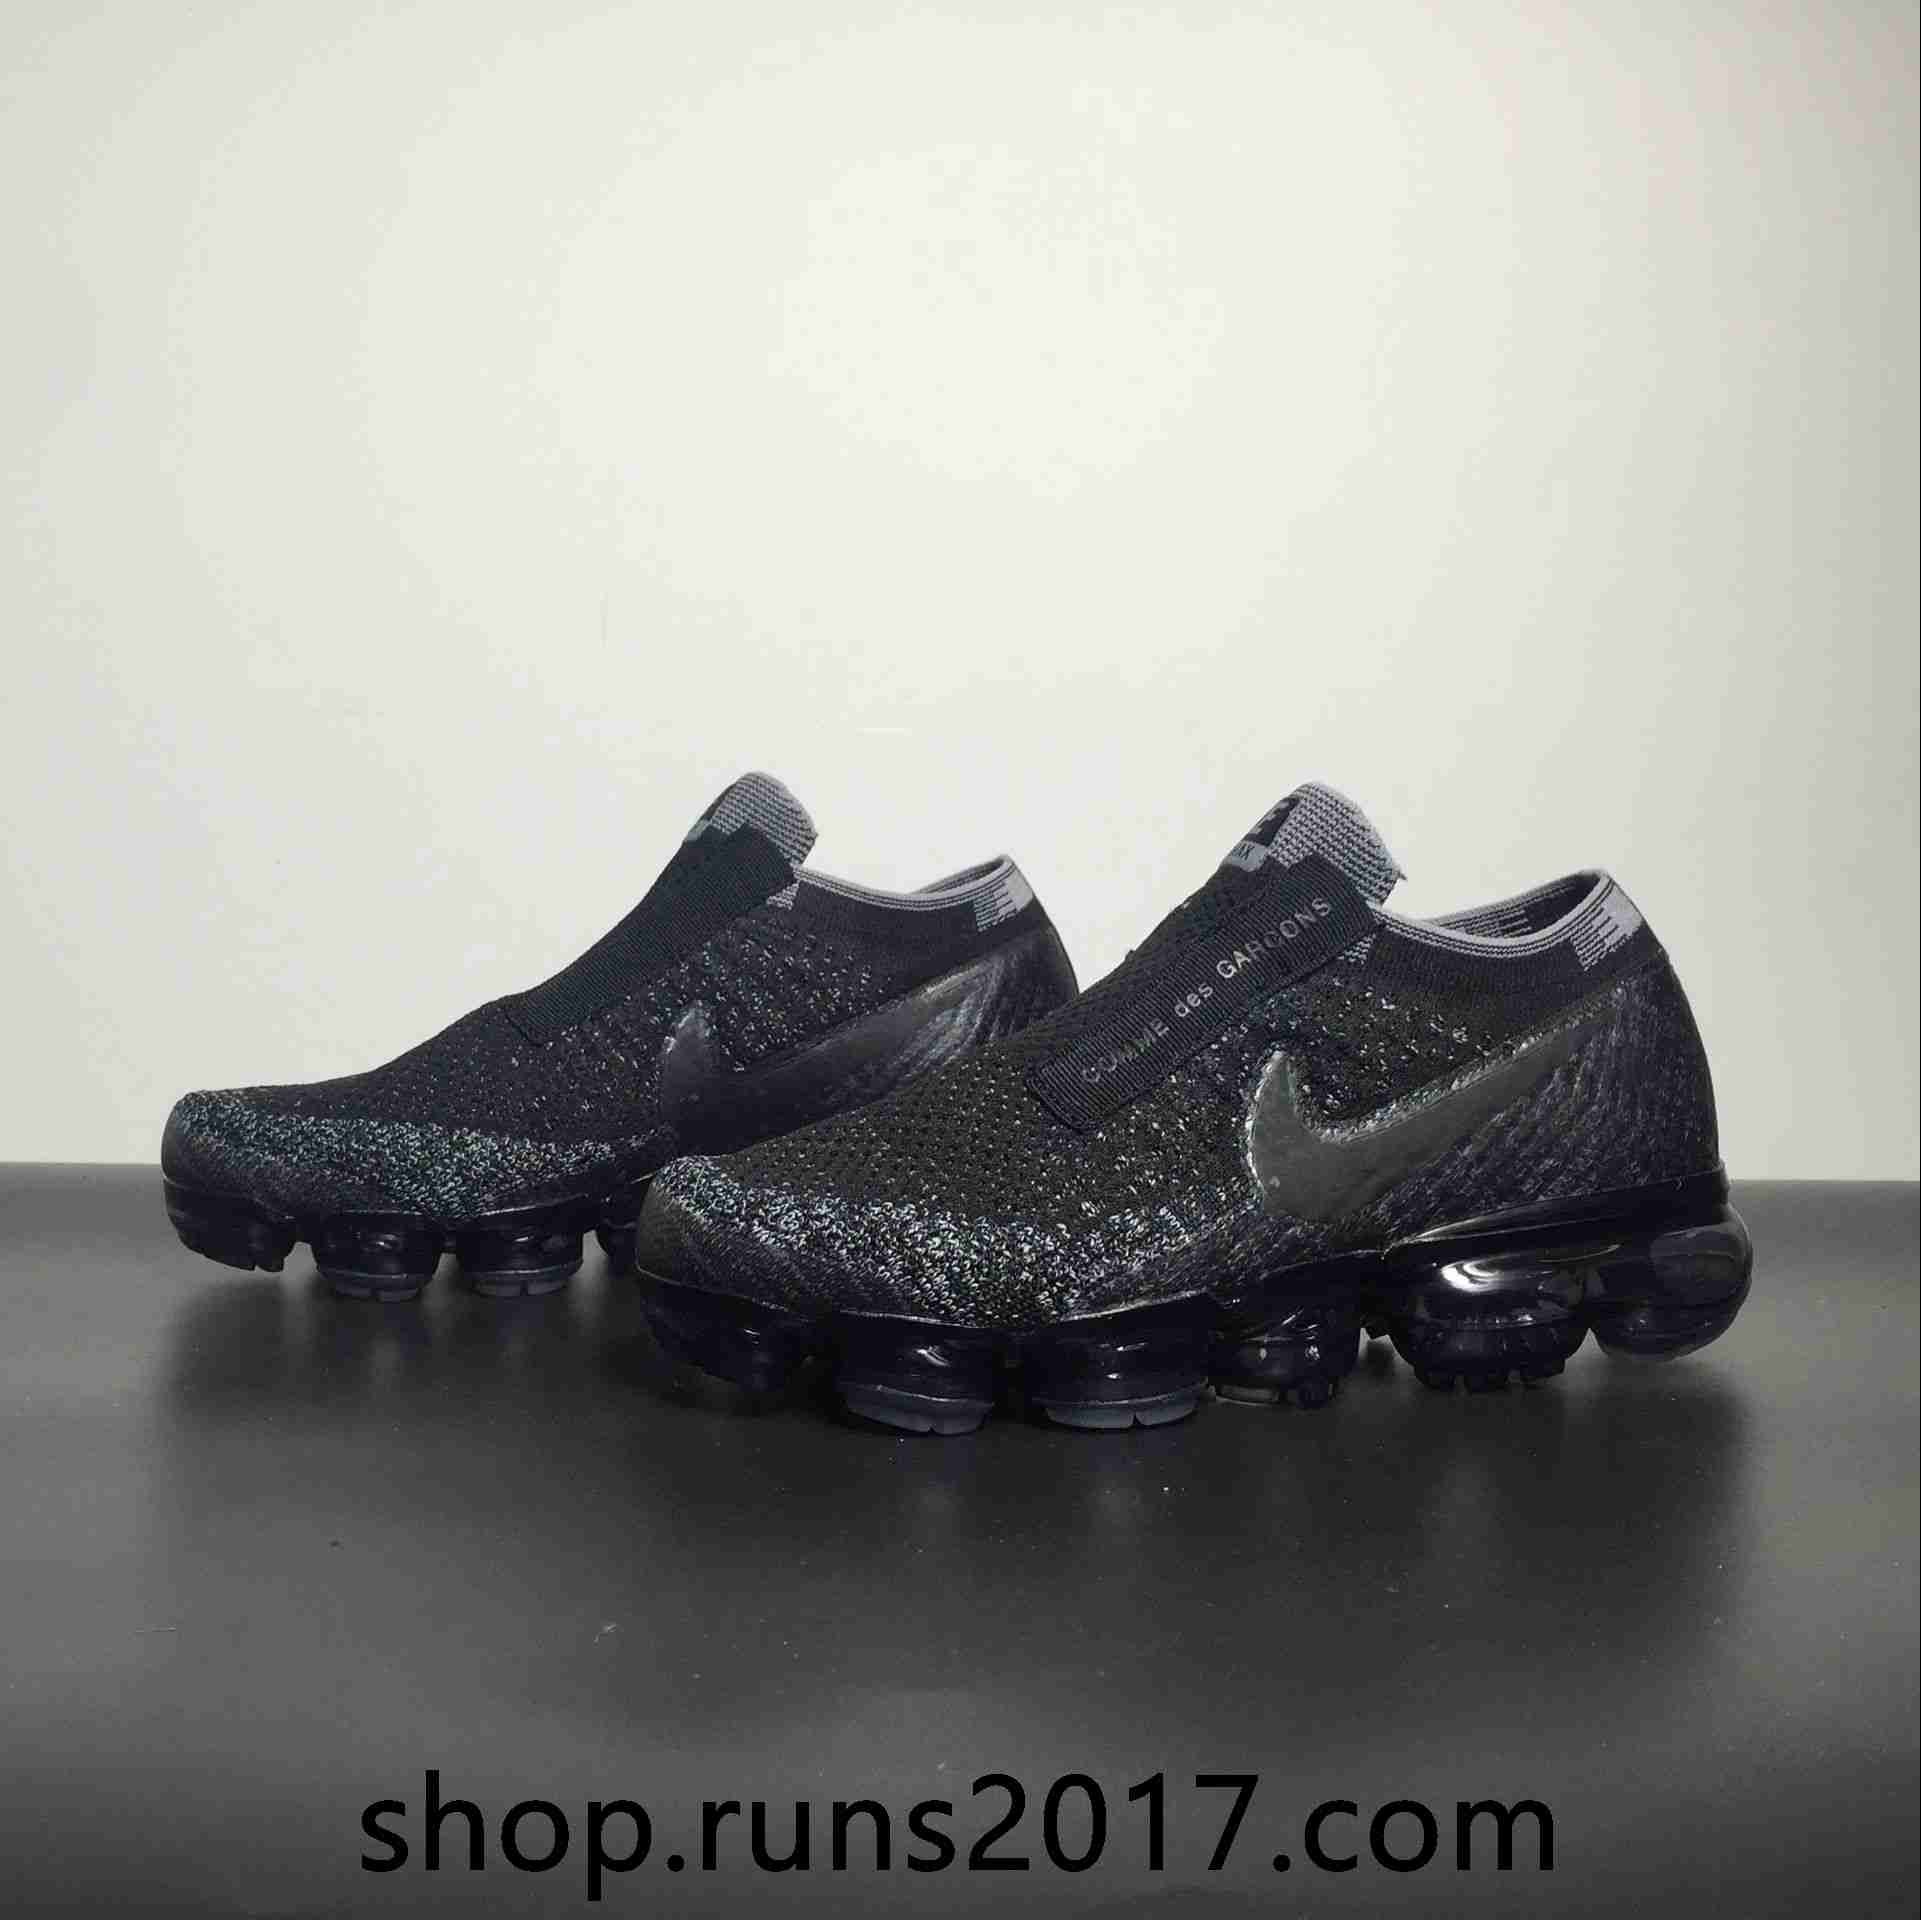 66df14b88e3d Nike Air VaporMax 2018 Flyknit Black Gray Women Men Shoes